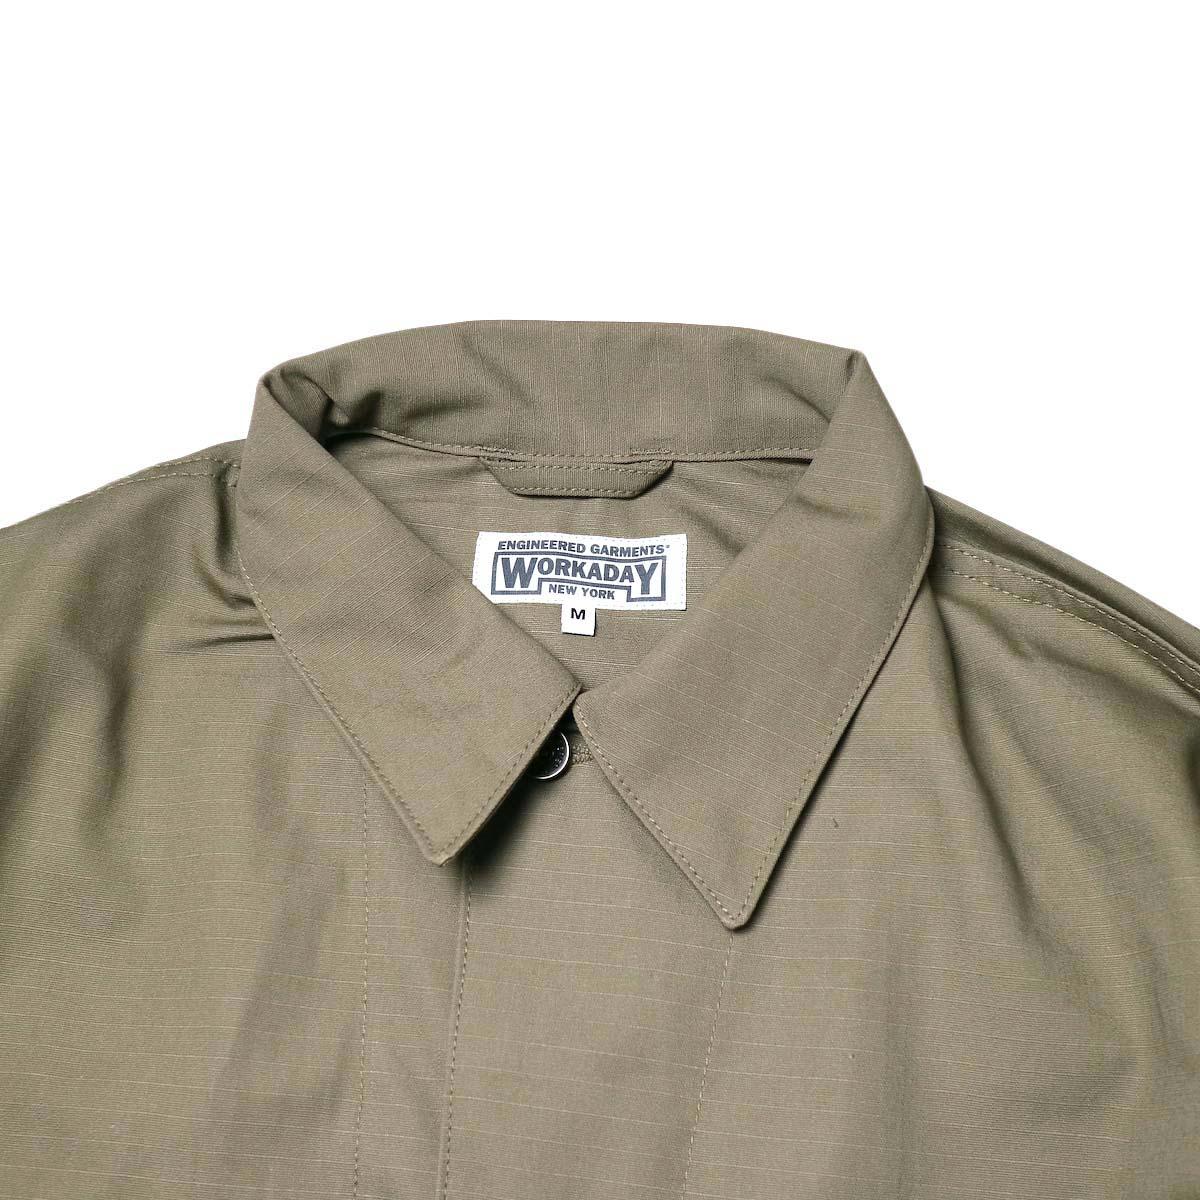 Engineered Garments Workaday / Utility Jacket - Cotton Ripstop (Khaki)襟